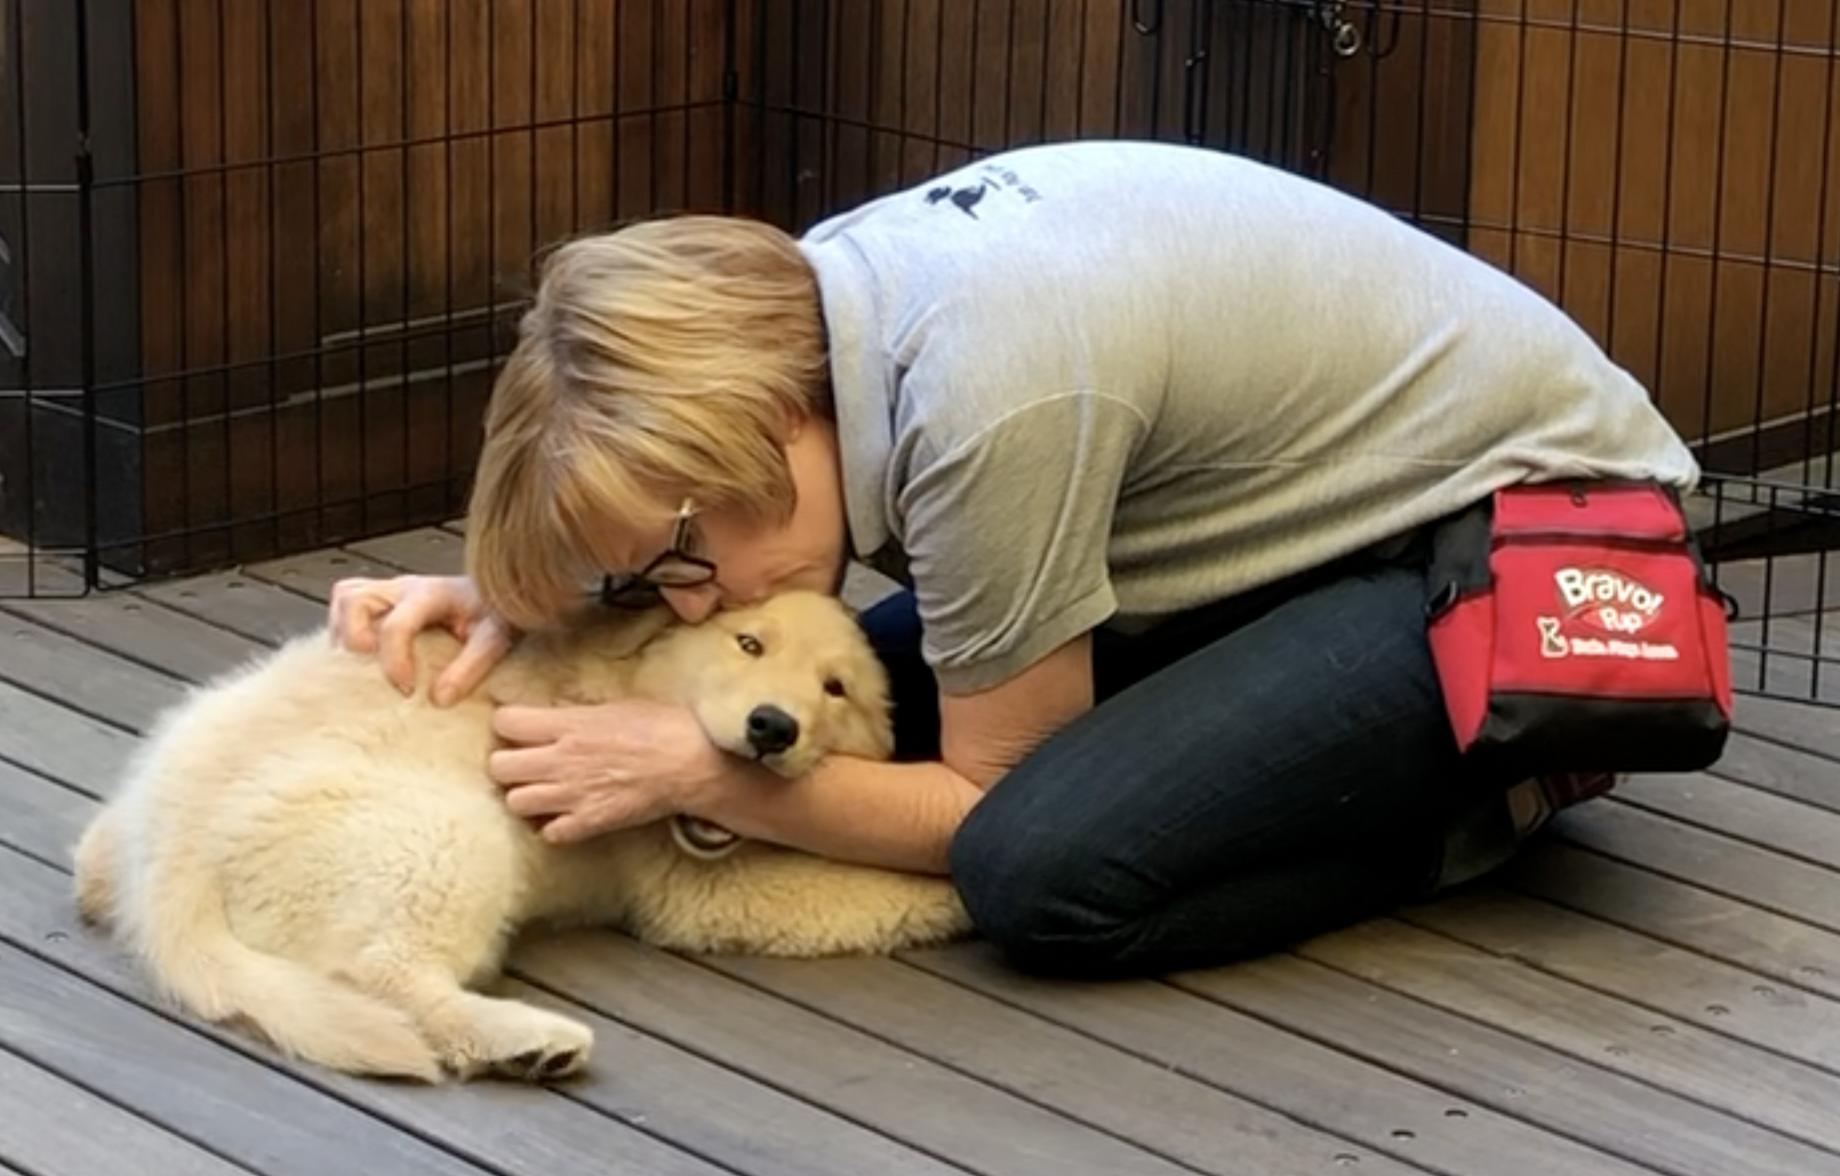 Sandi Thompson Bravopup dog trainer and owner.